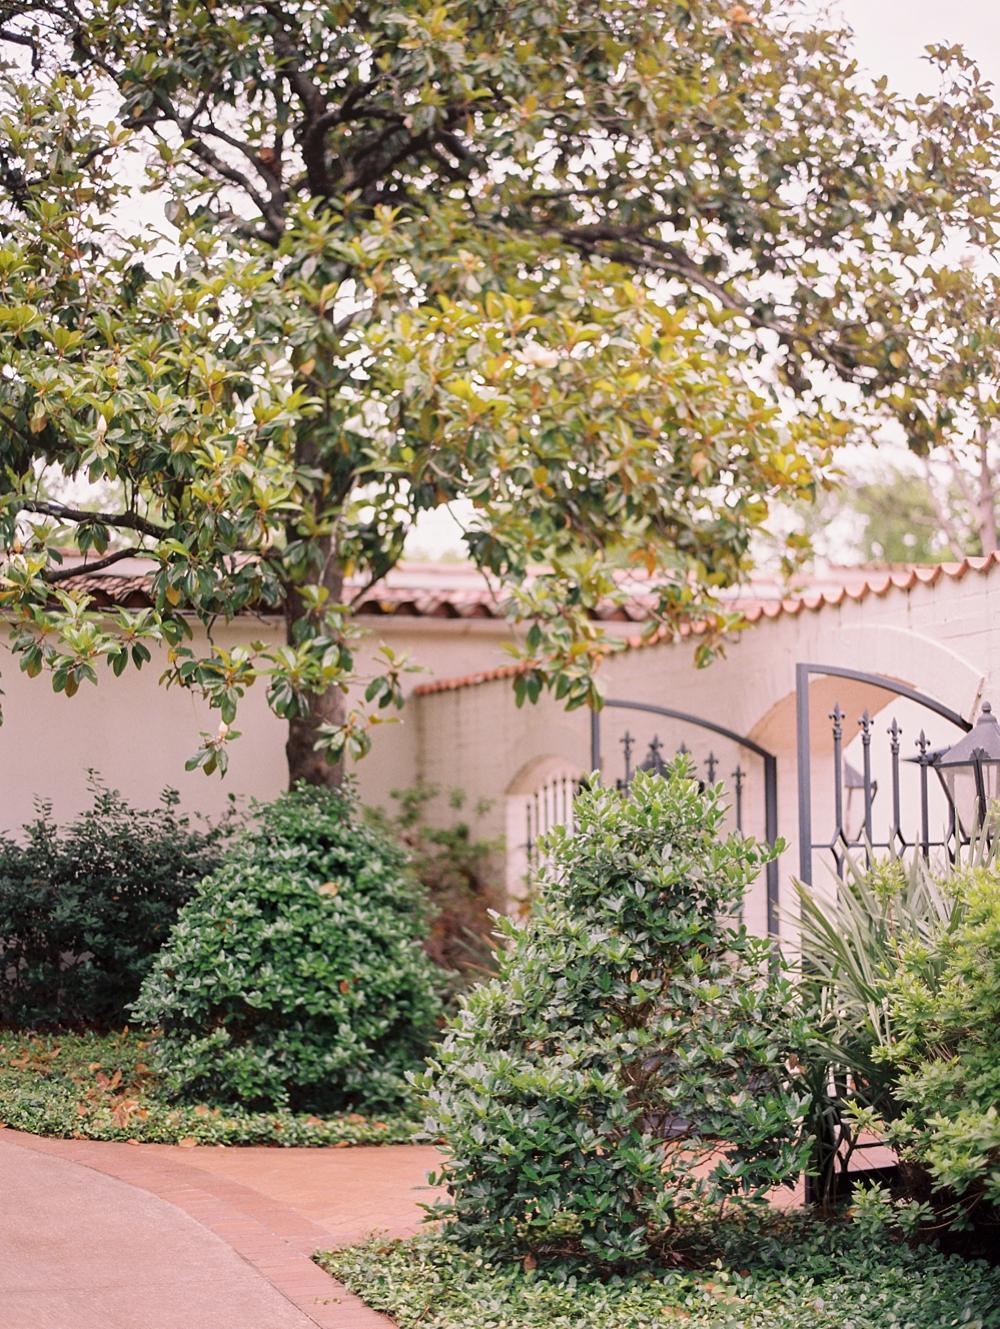 kristin-la-voie-photography-Dallas-wedding-photographer-Arboretum-42